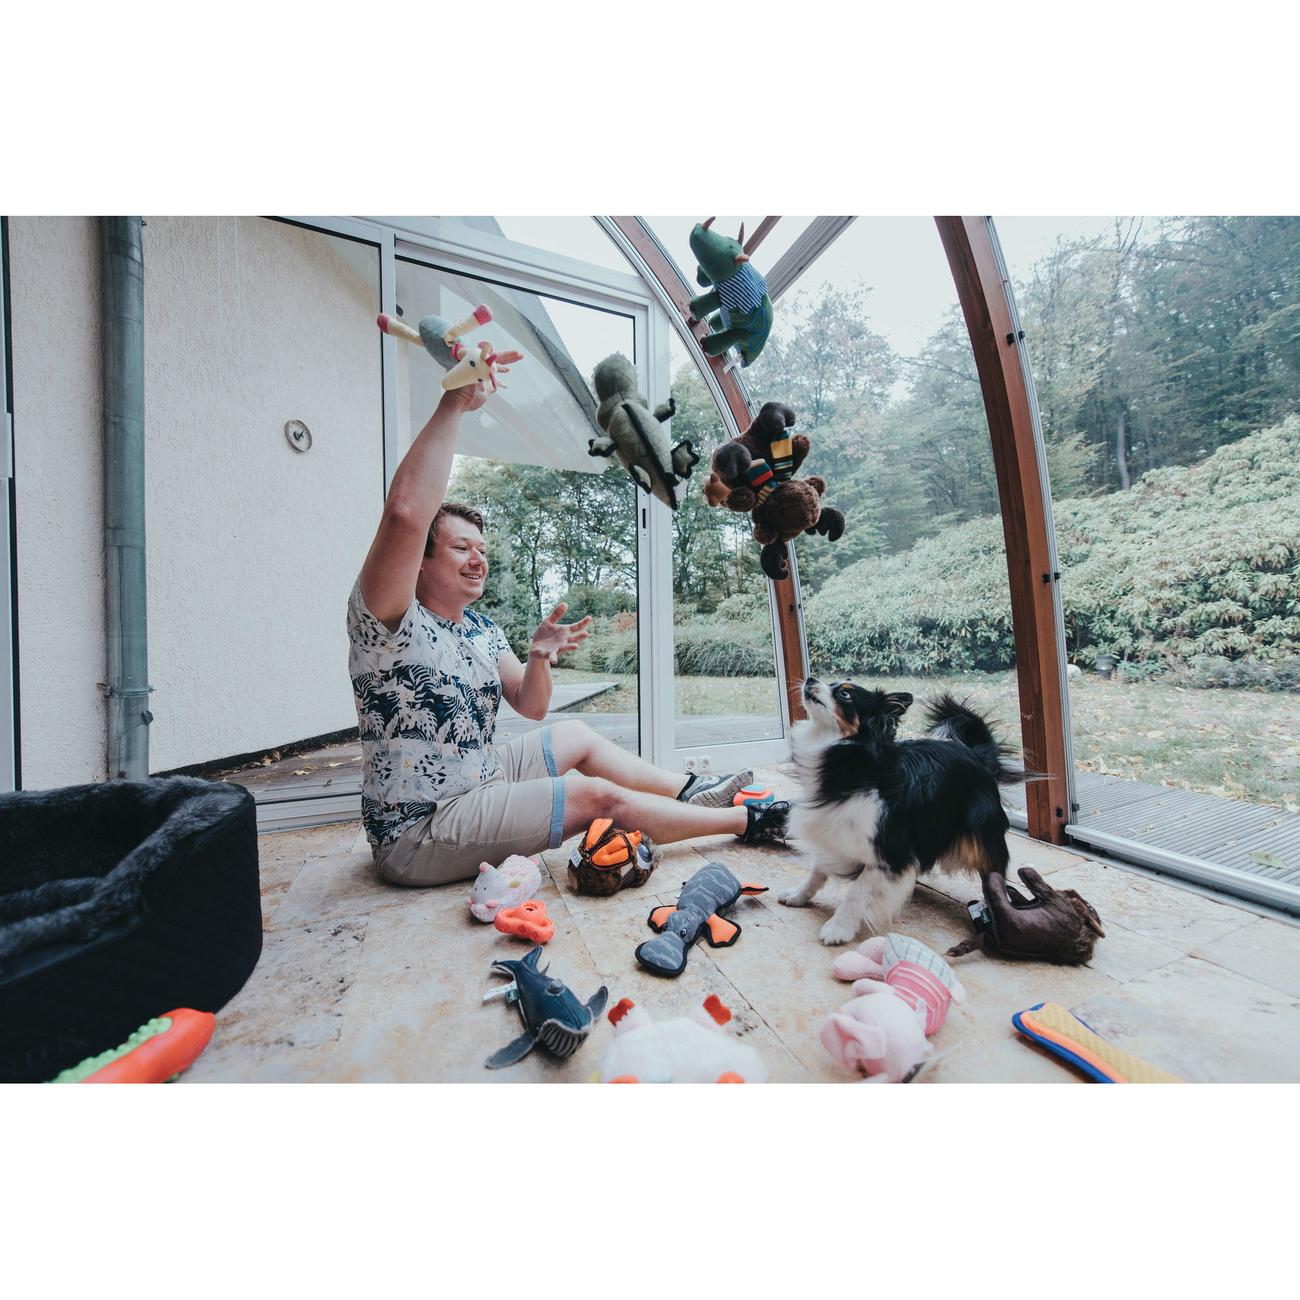 Hunter Hundespielzeug Tough Toys 66549, Bild 5